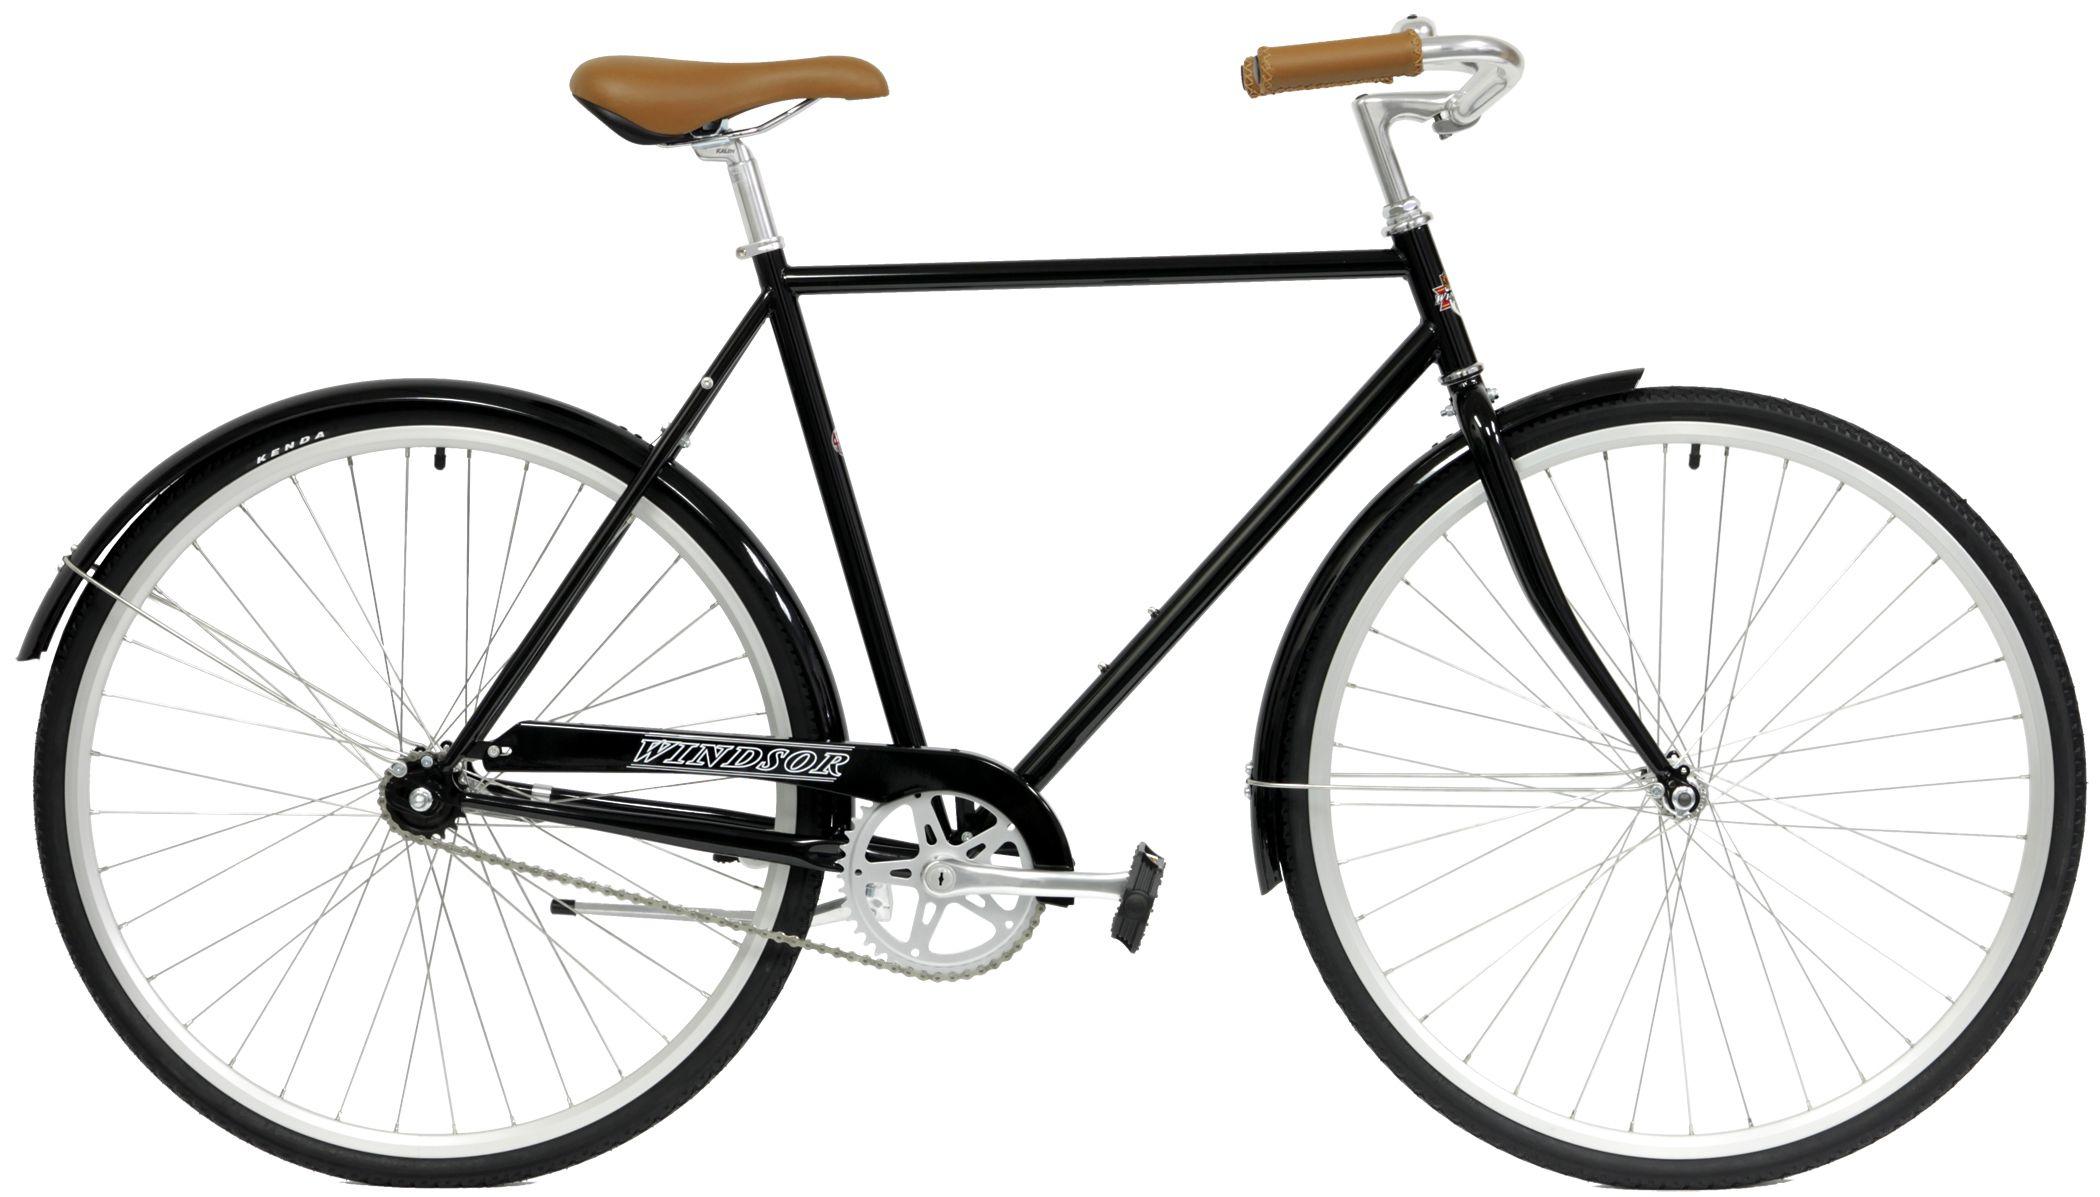 Town Bikes Classic Stylish City Bikes Urban Bikes Commuter